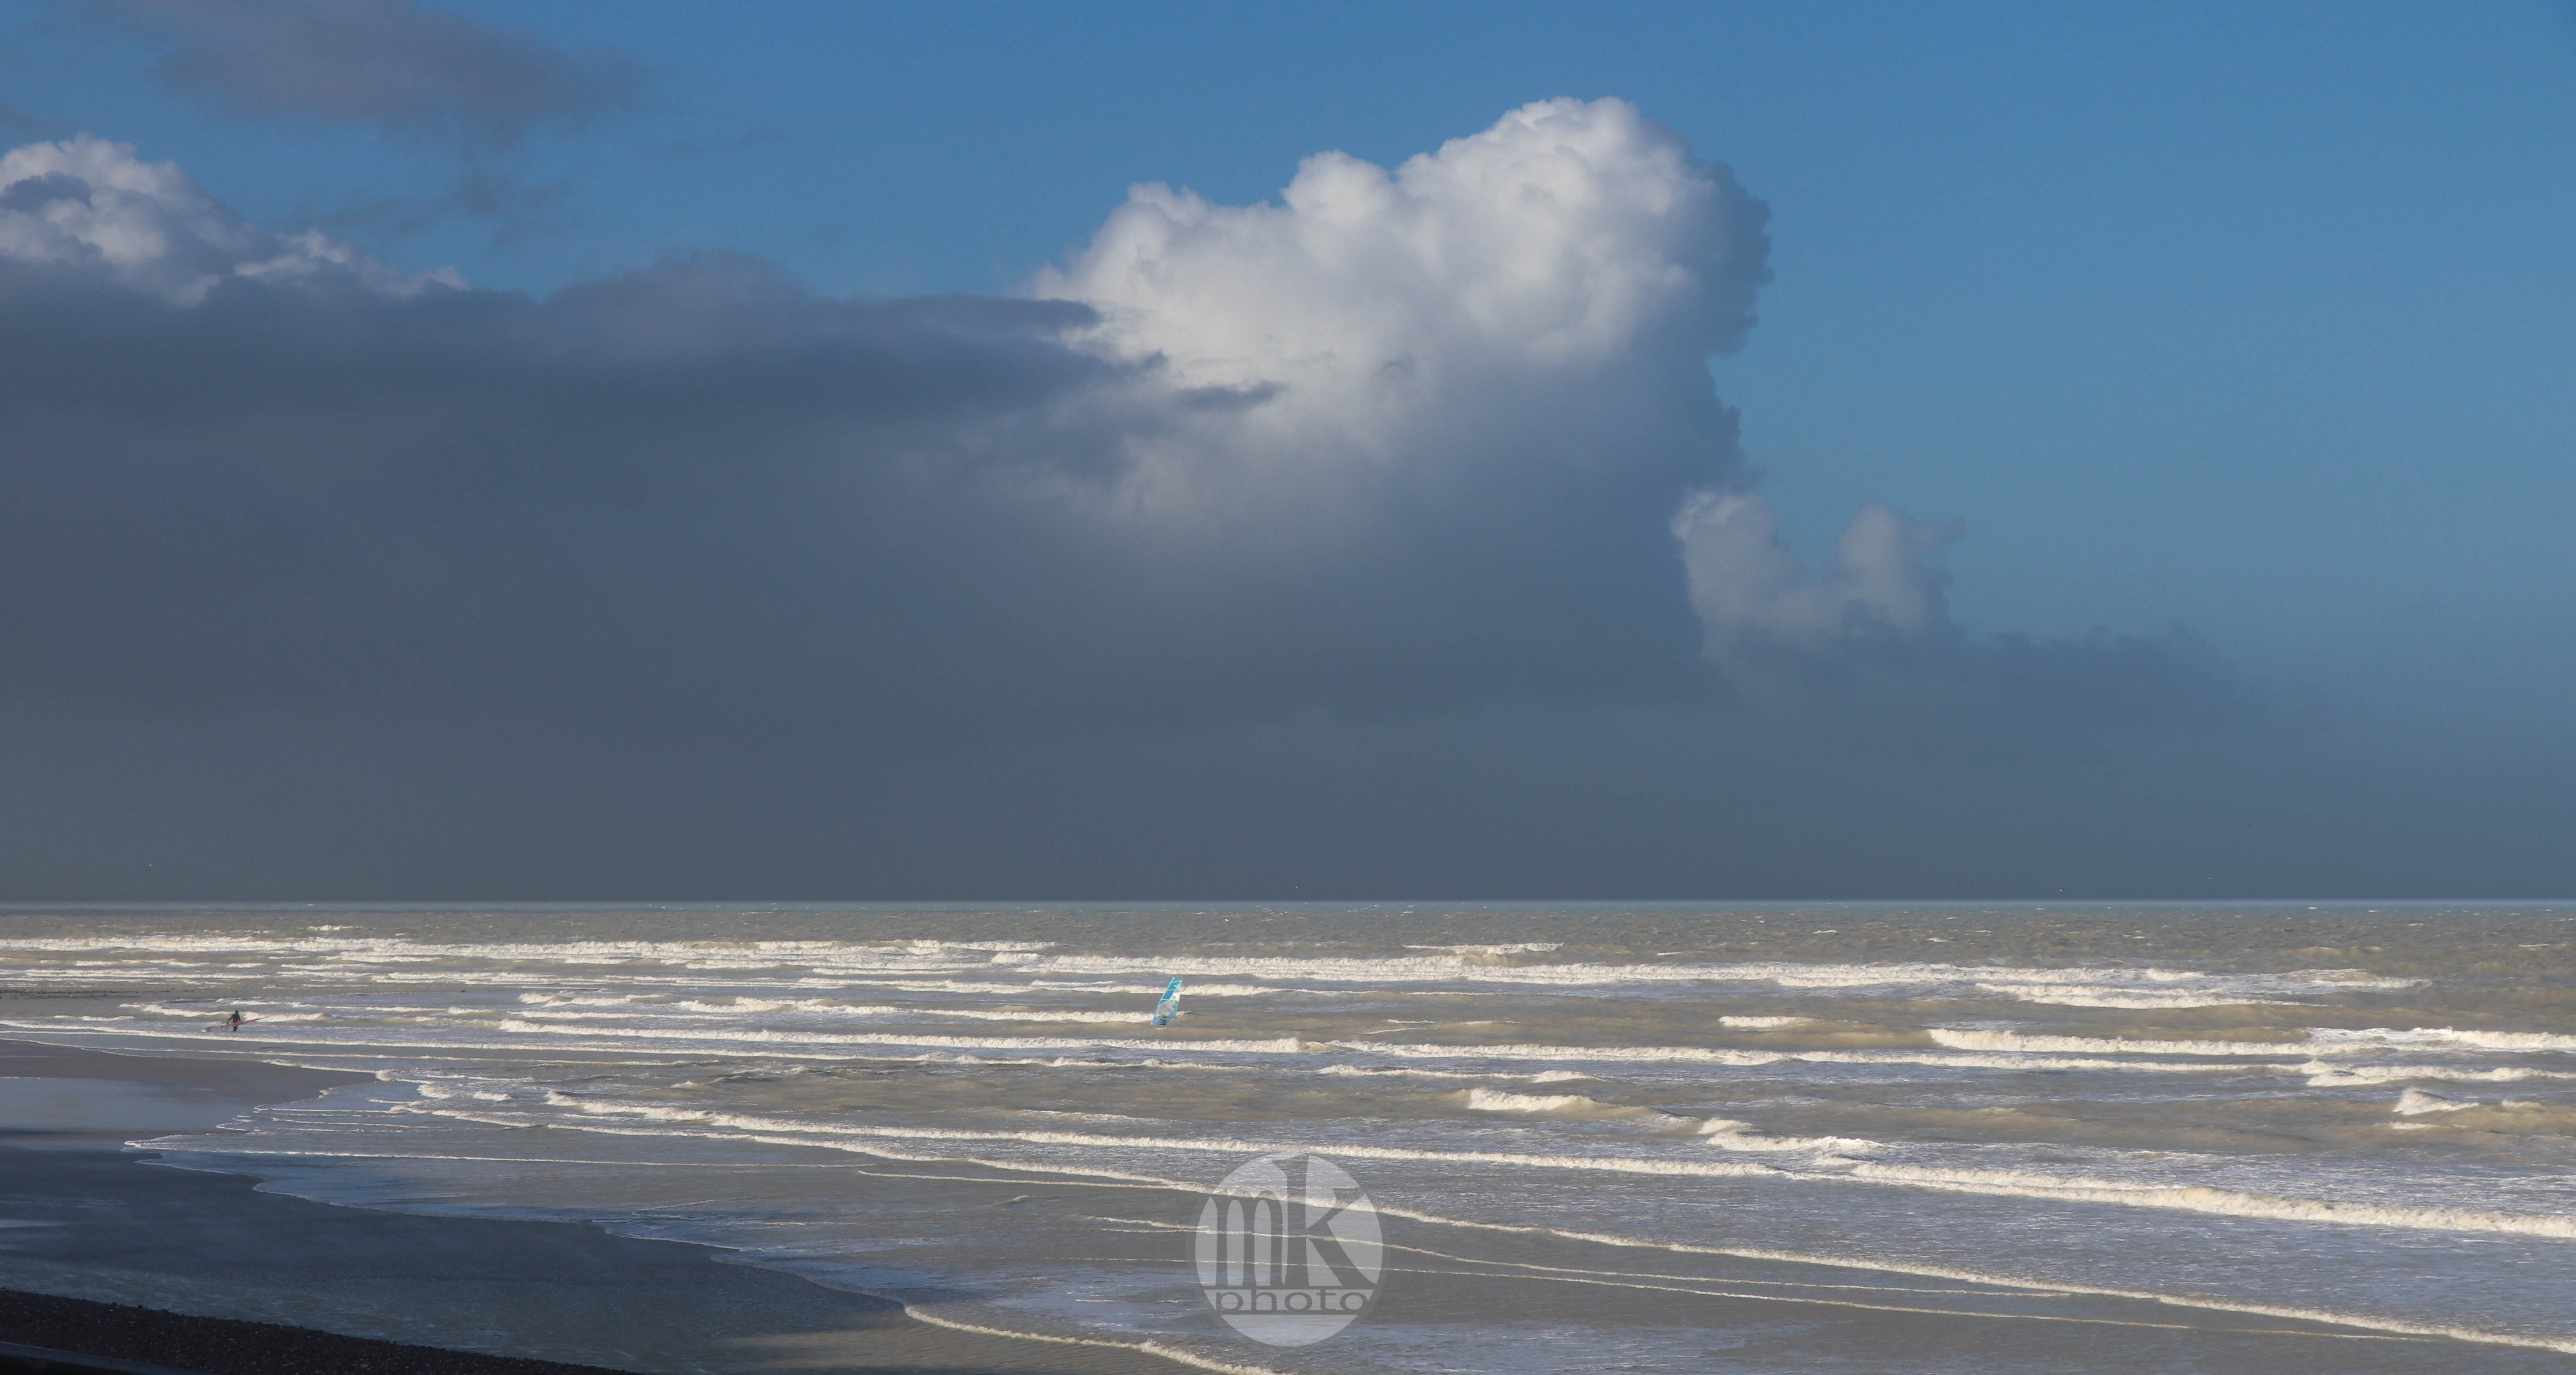 St Aubin s mer, 23 déc.19, 13h20.jpg